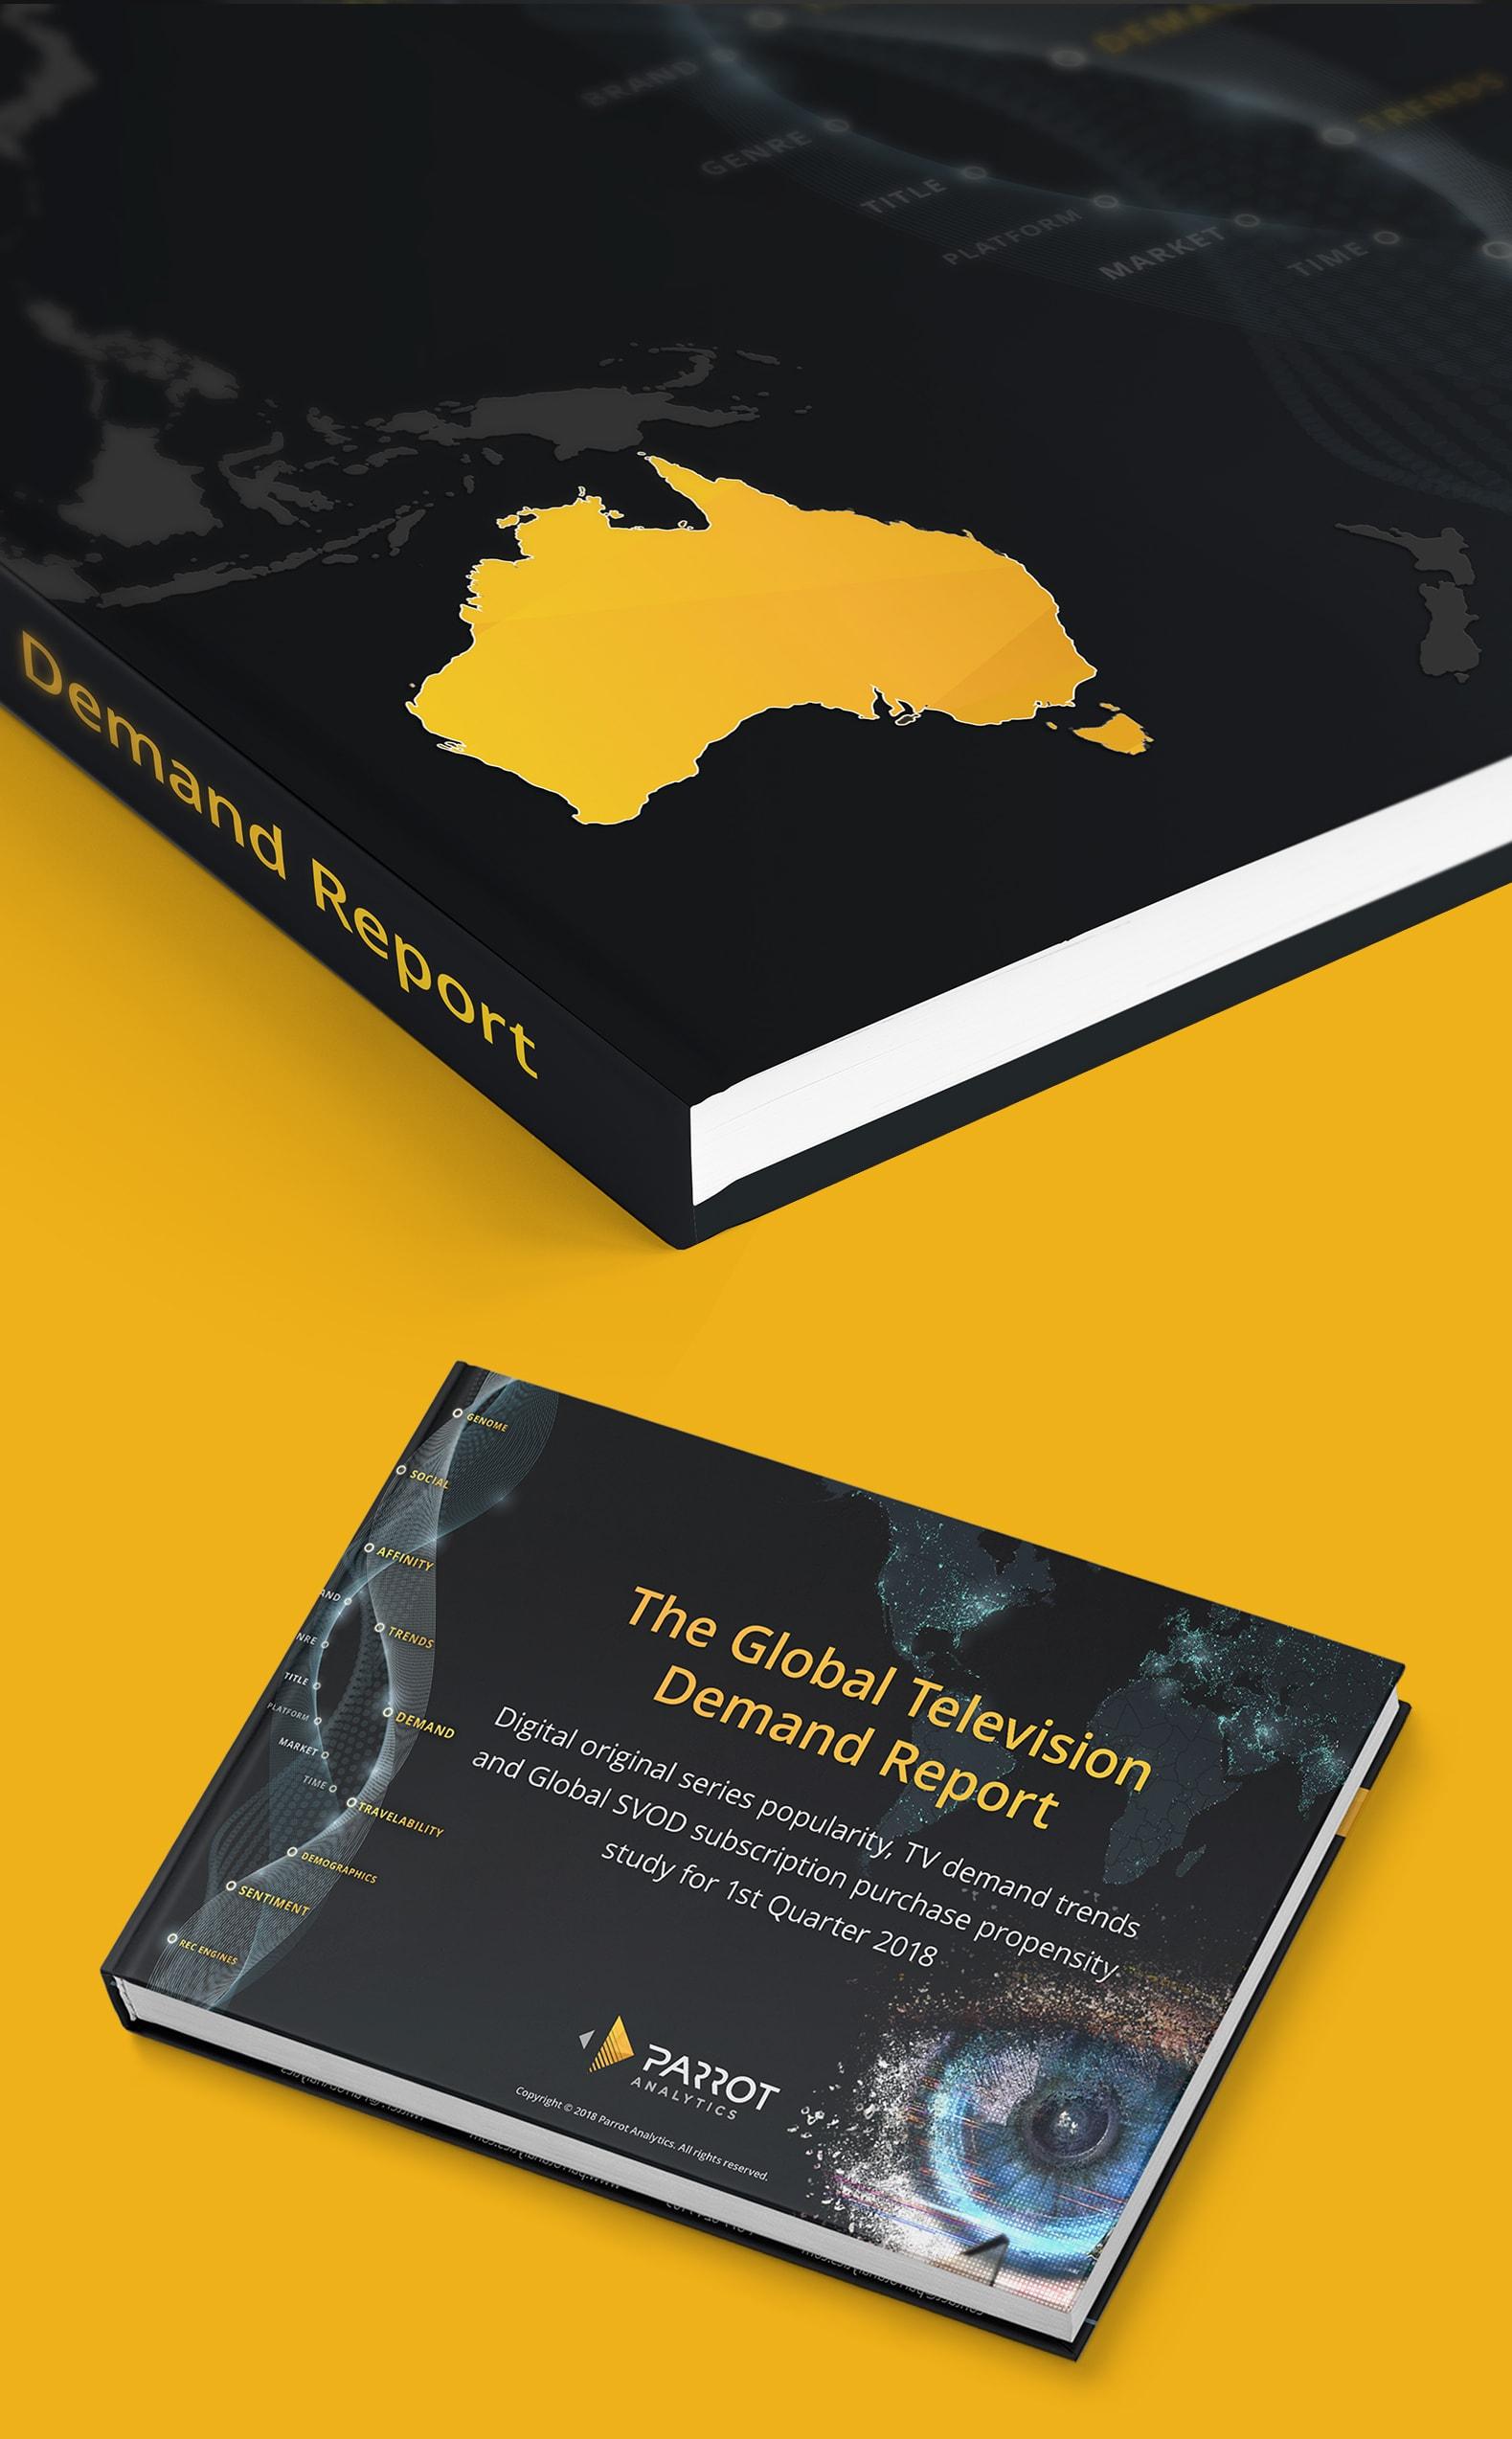 Australia SVOD Trends and Australian OTT data analysis - The